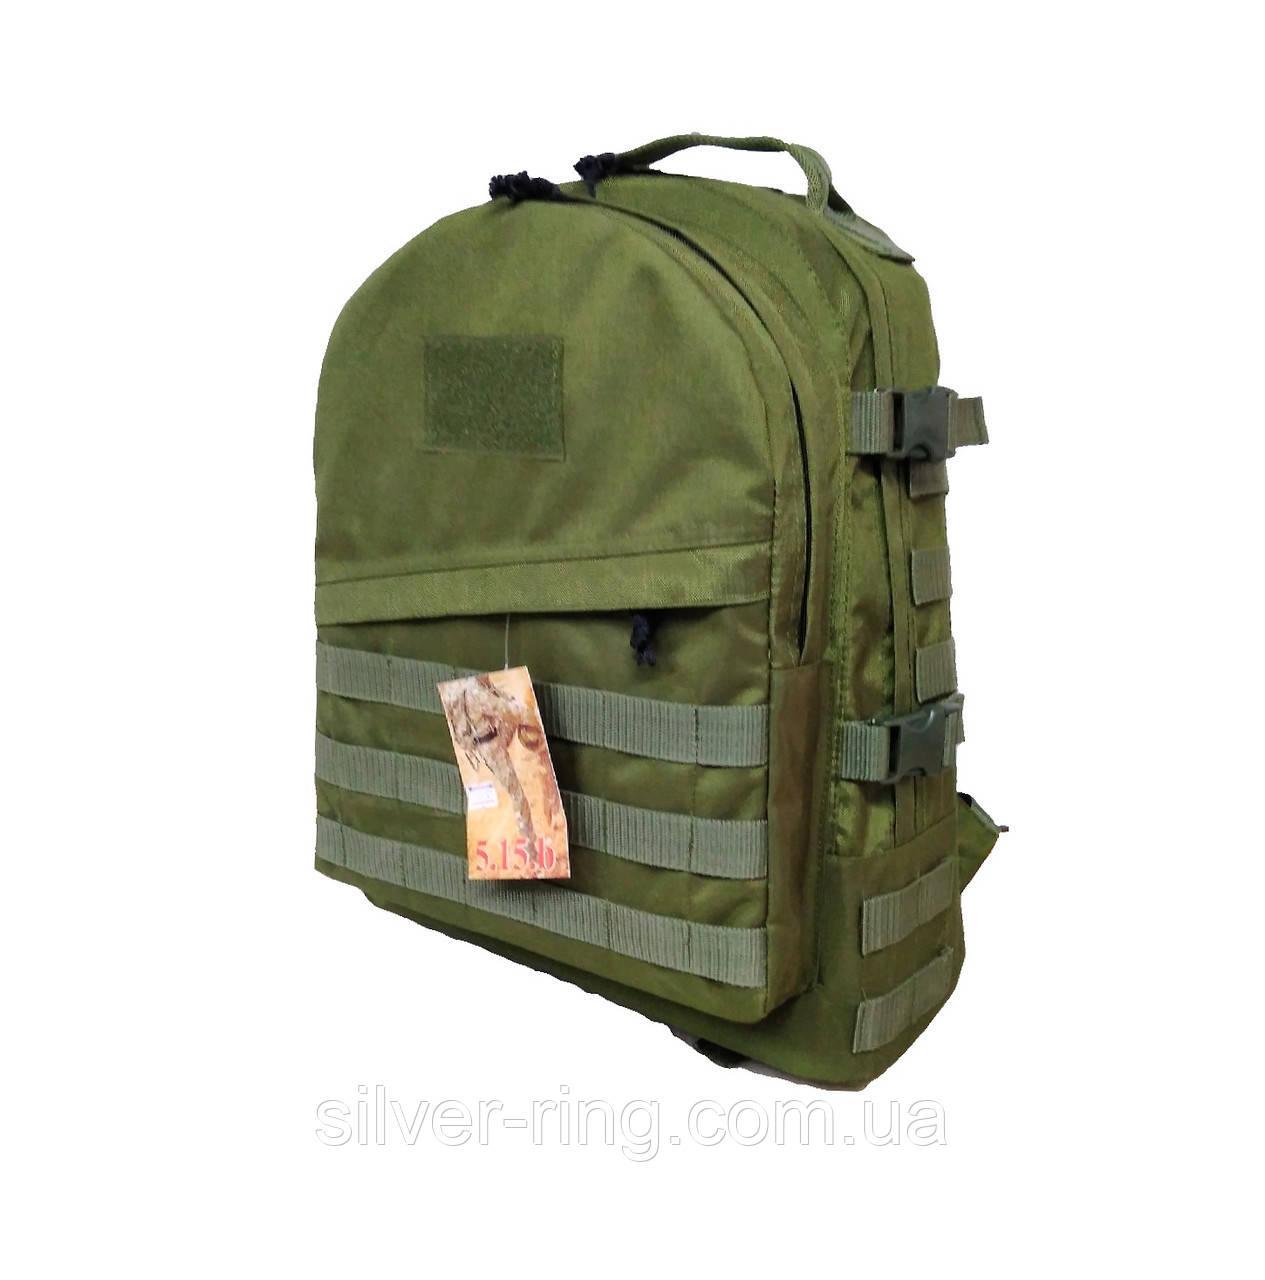 Тактический армейский супер-крепкий рюкзак 30 литров олива